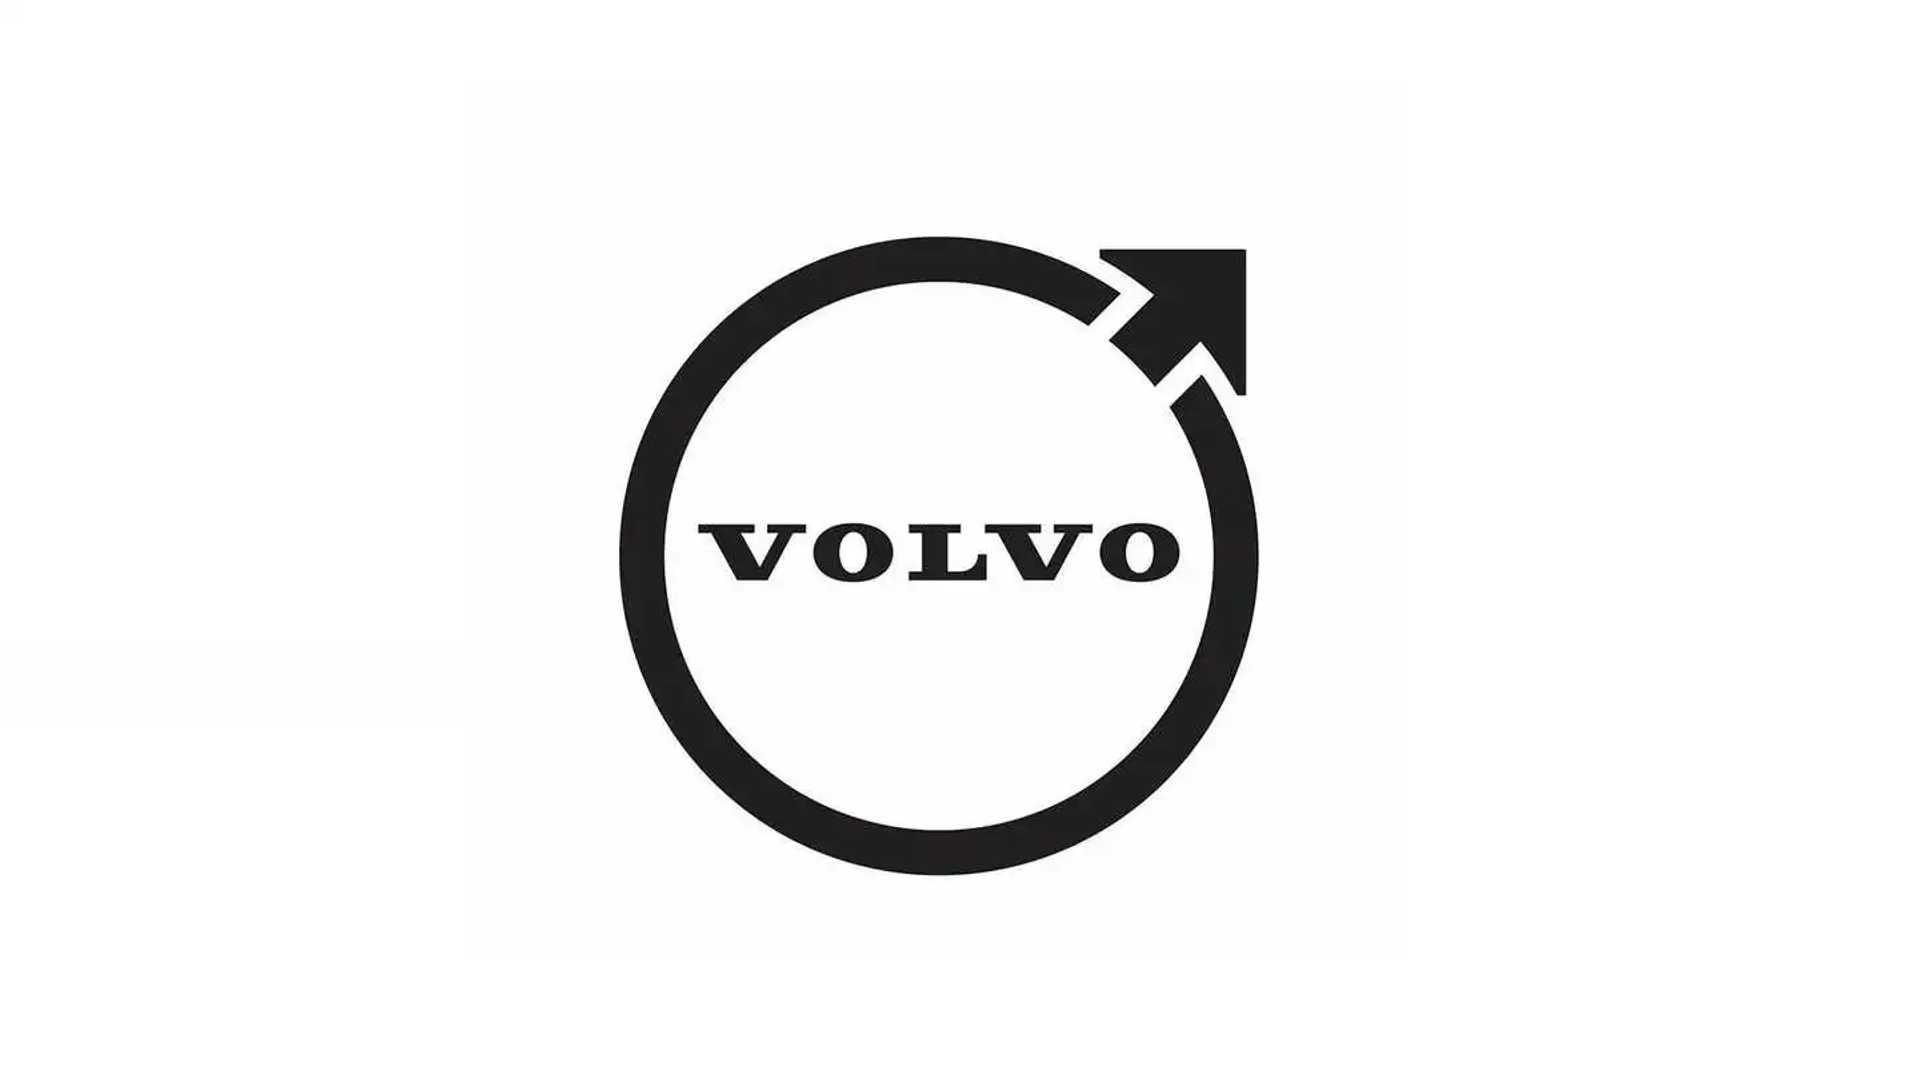 Volvo atualiza logotipo e adota design com pegada minimalista